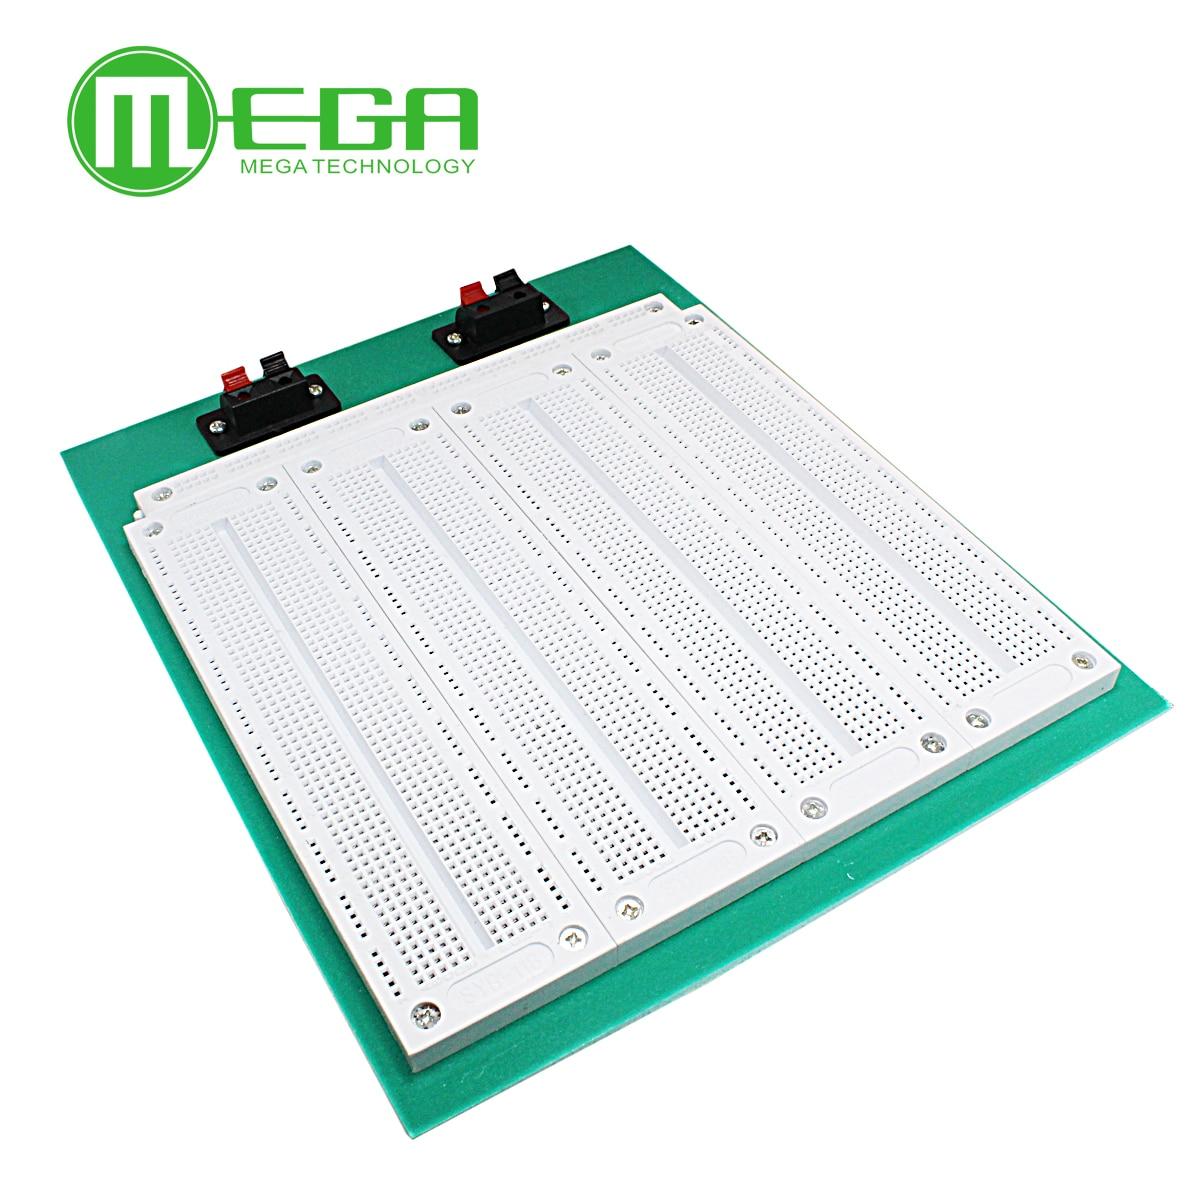 SYB-500 4 block combiner breadboard circuit board universal board / breadboard